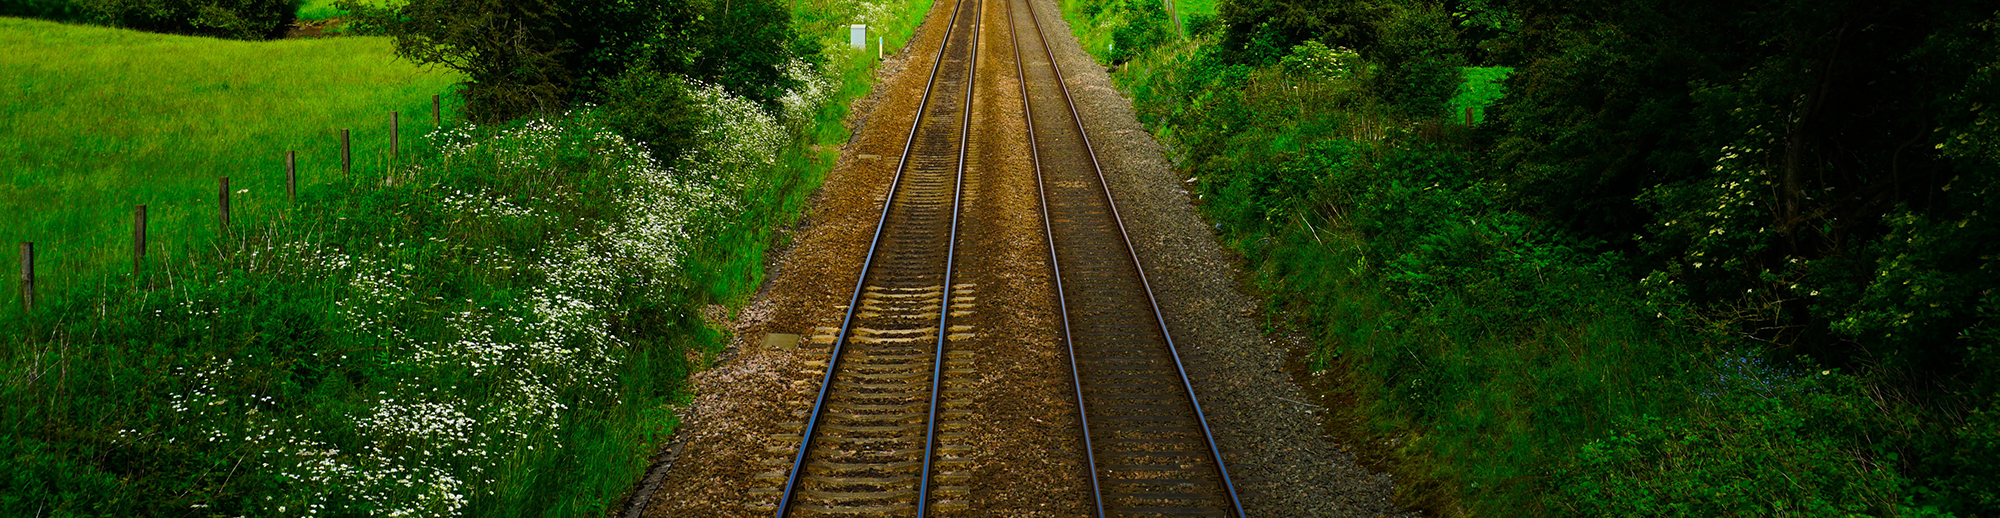 Järnvägsspår i grönska